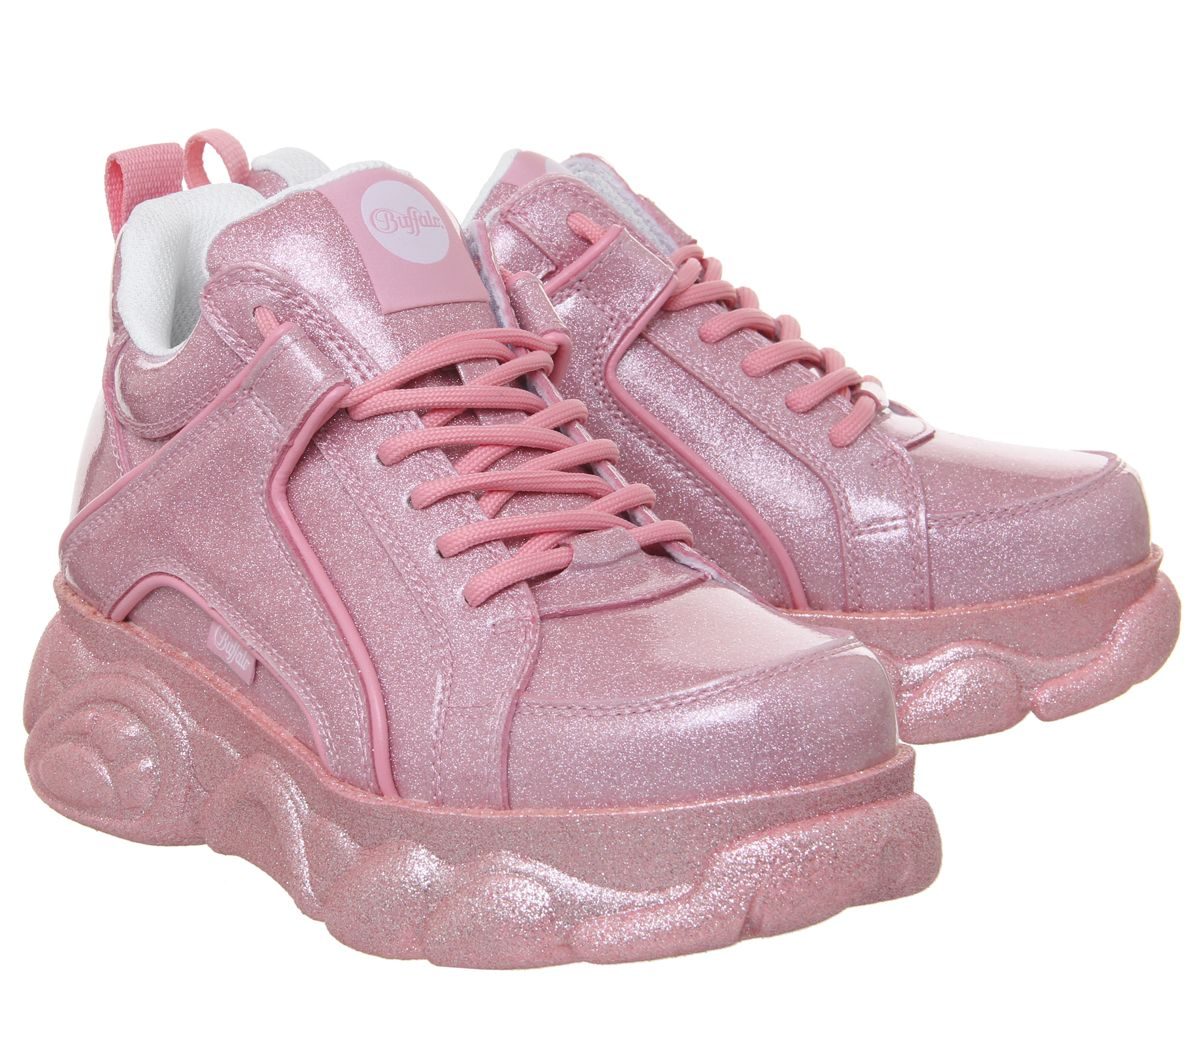 Womens Buffalo Corin Sneakers Pink Trainers shoes shoes shoes f228c6